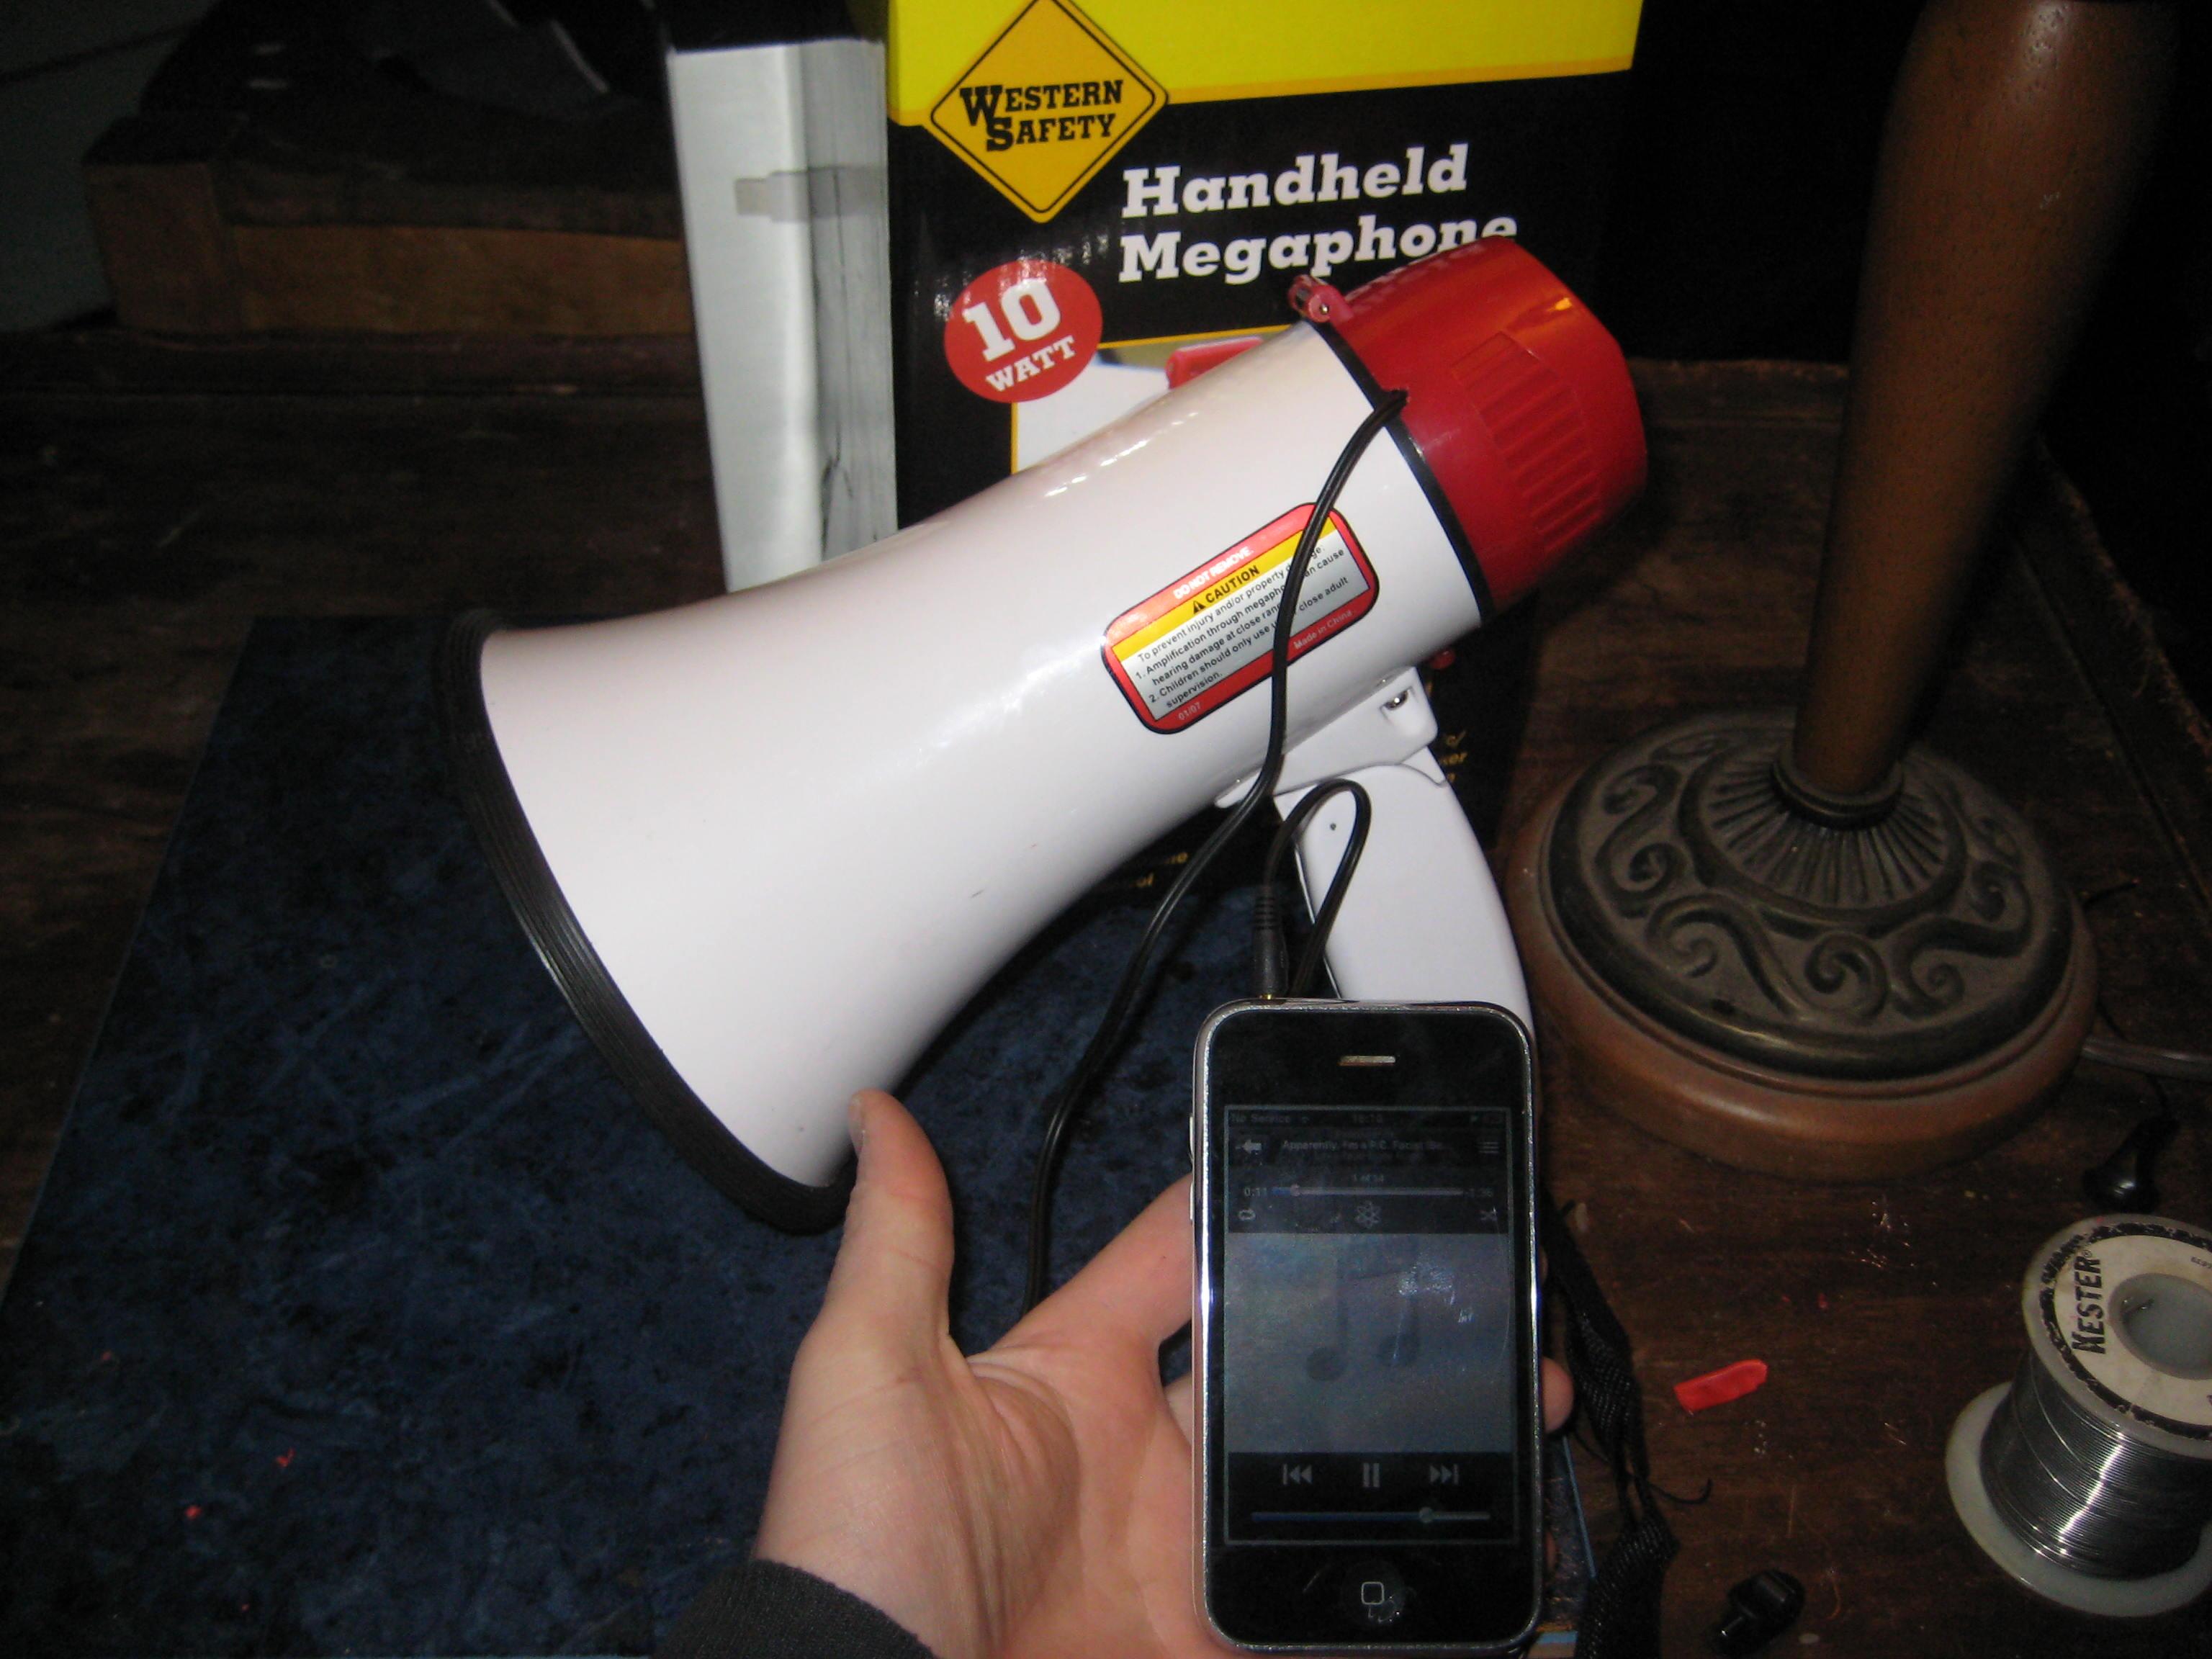 Add an audio input to a megaphone